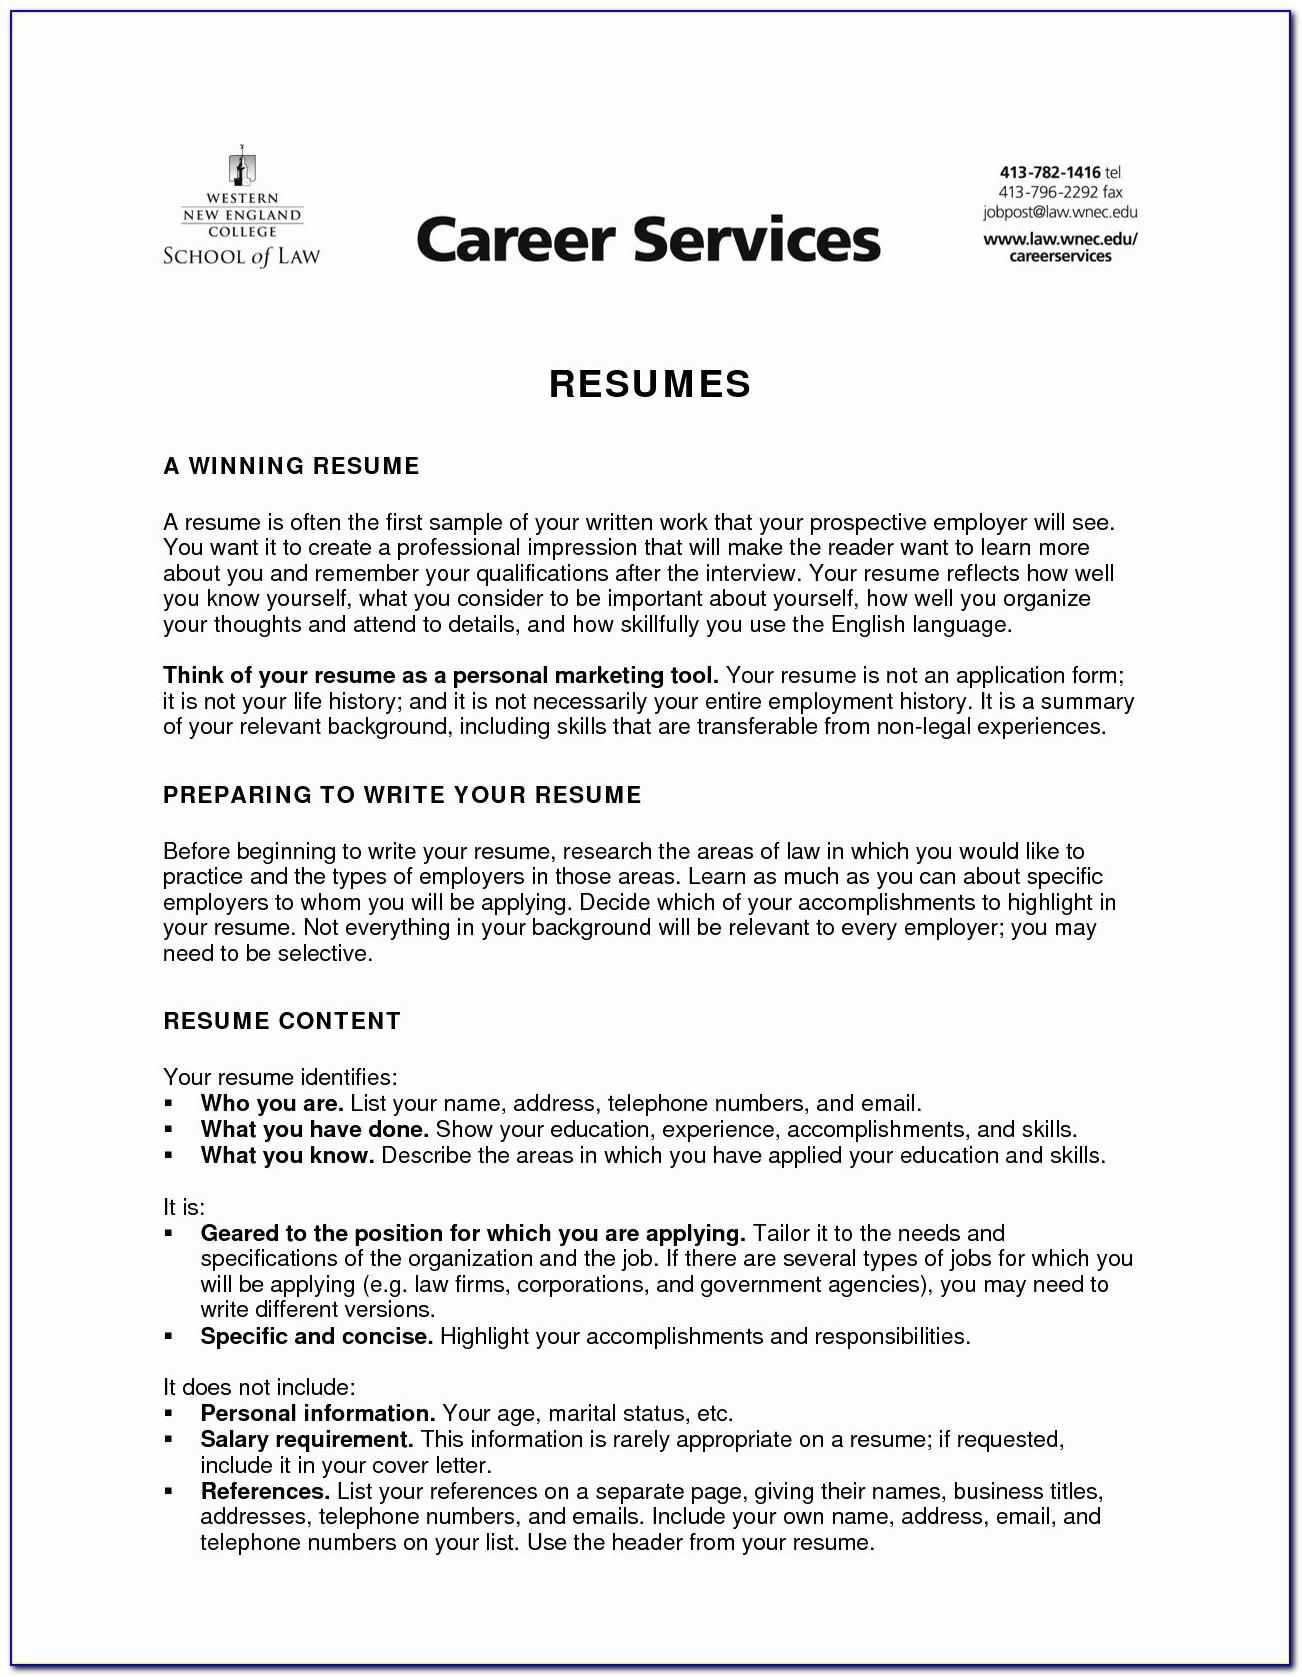 Resume Writer Needed Inspirational Resume Writer Jobs Luxury Beautiful Resumate Unique Academic Writers